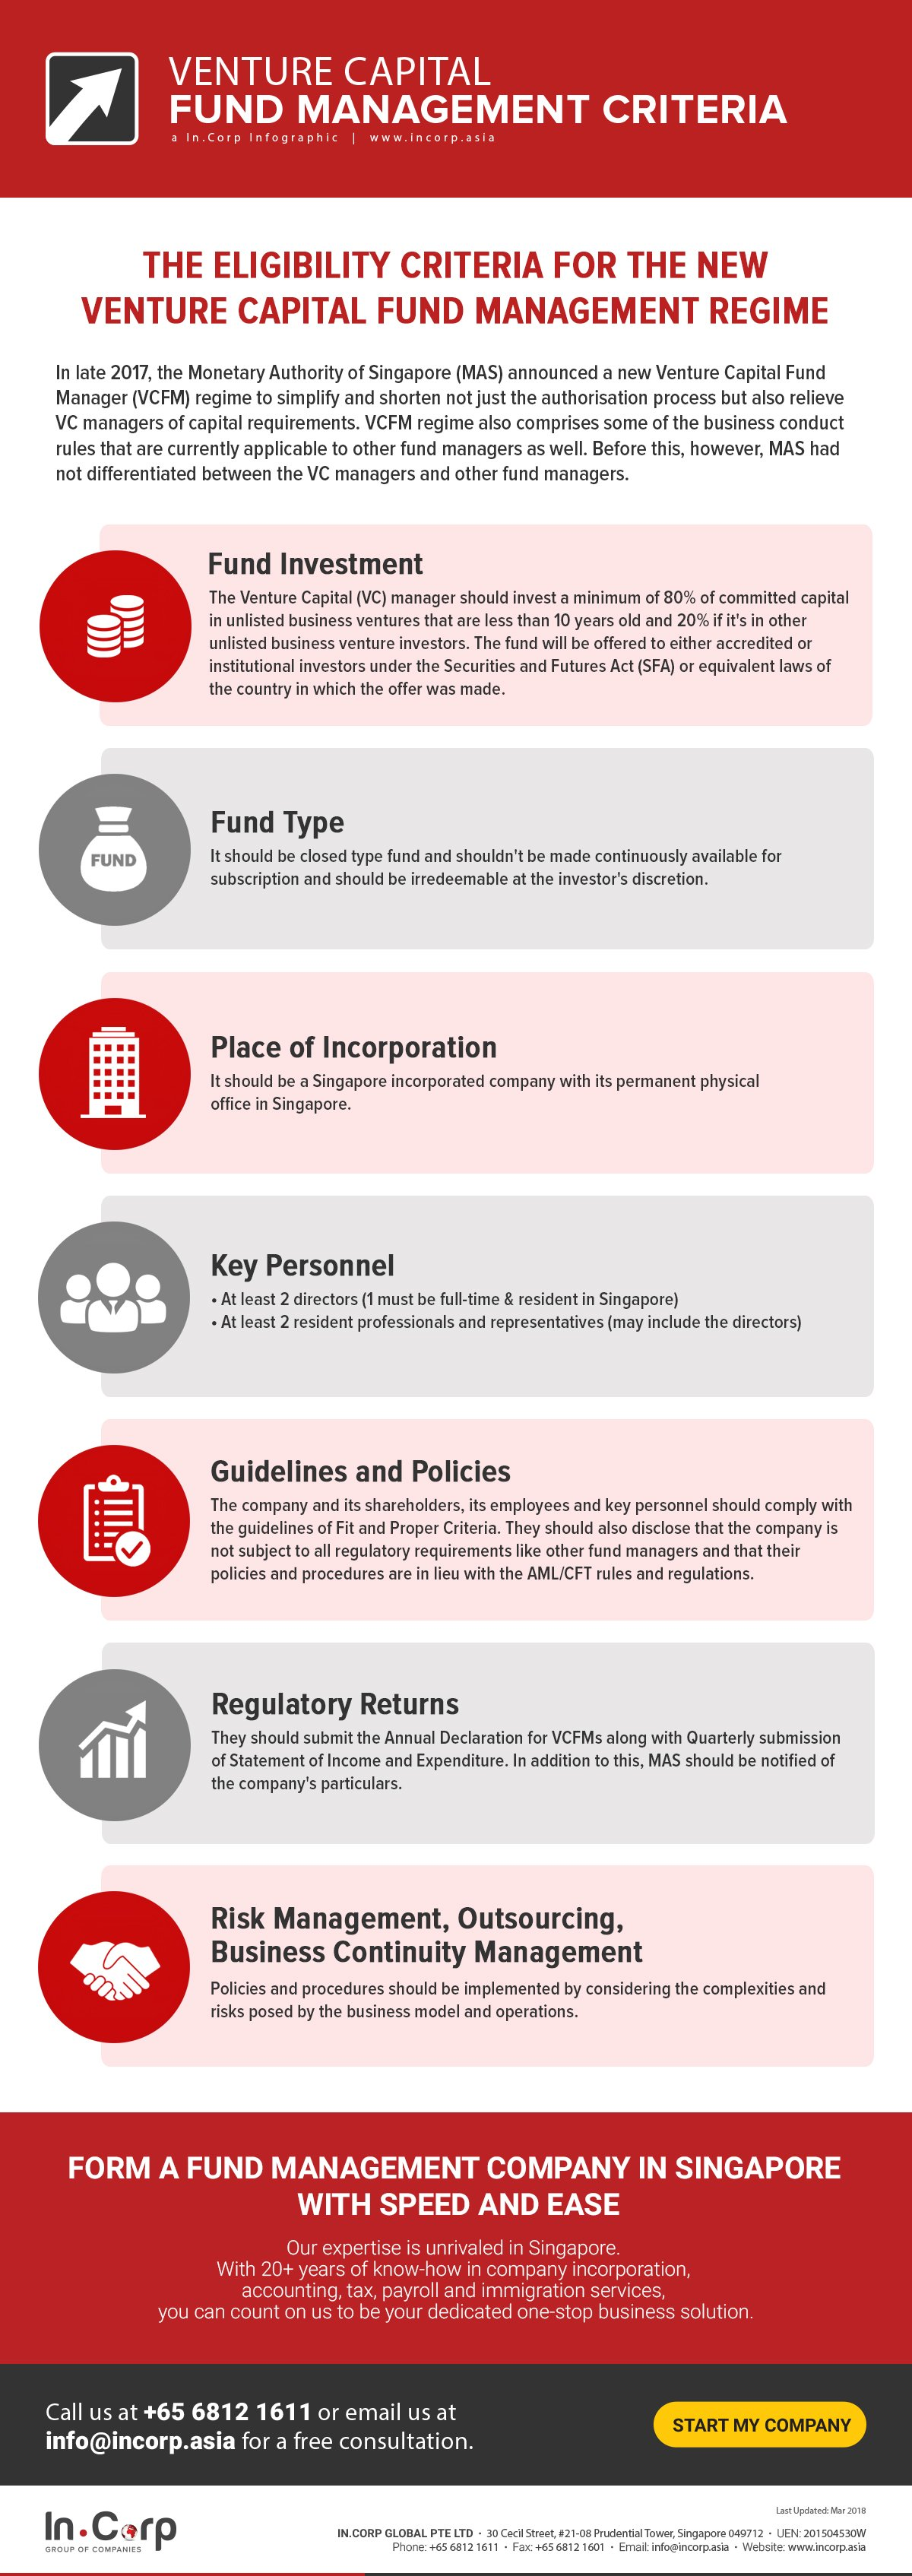 what are the venture caapital fund management criteria